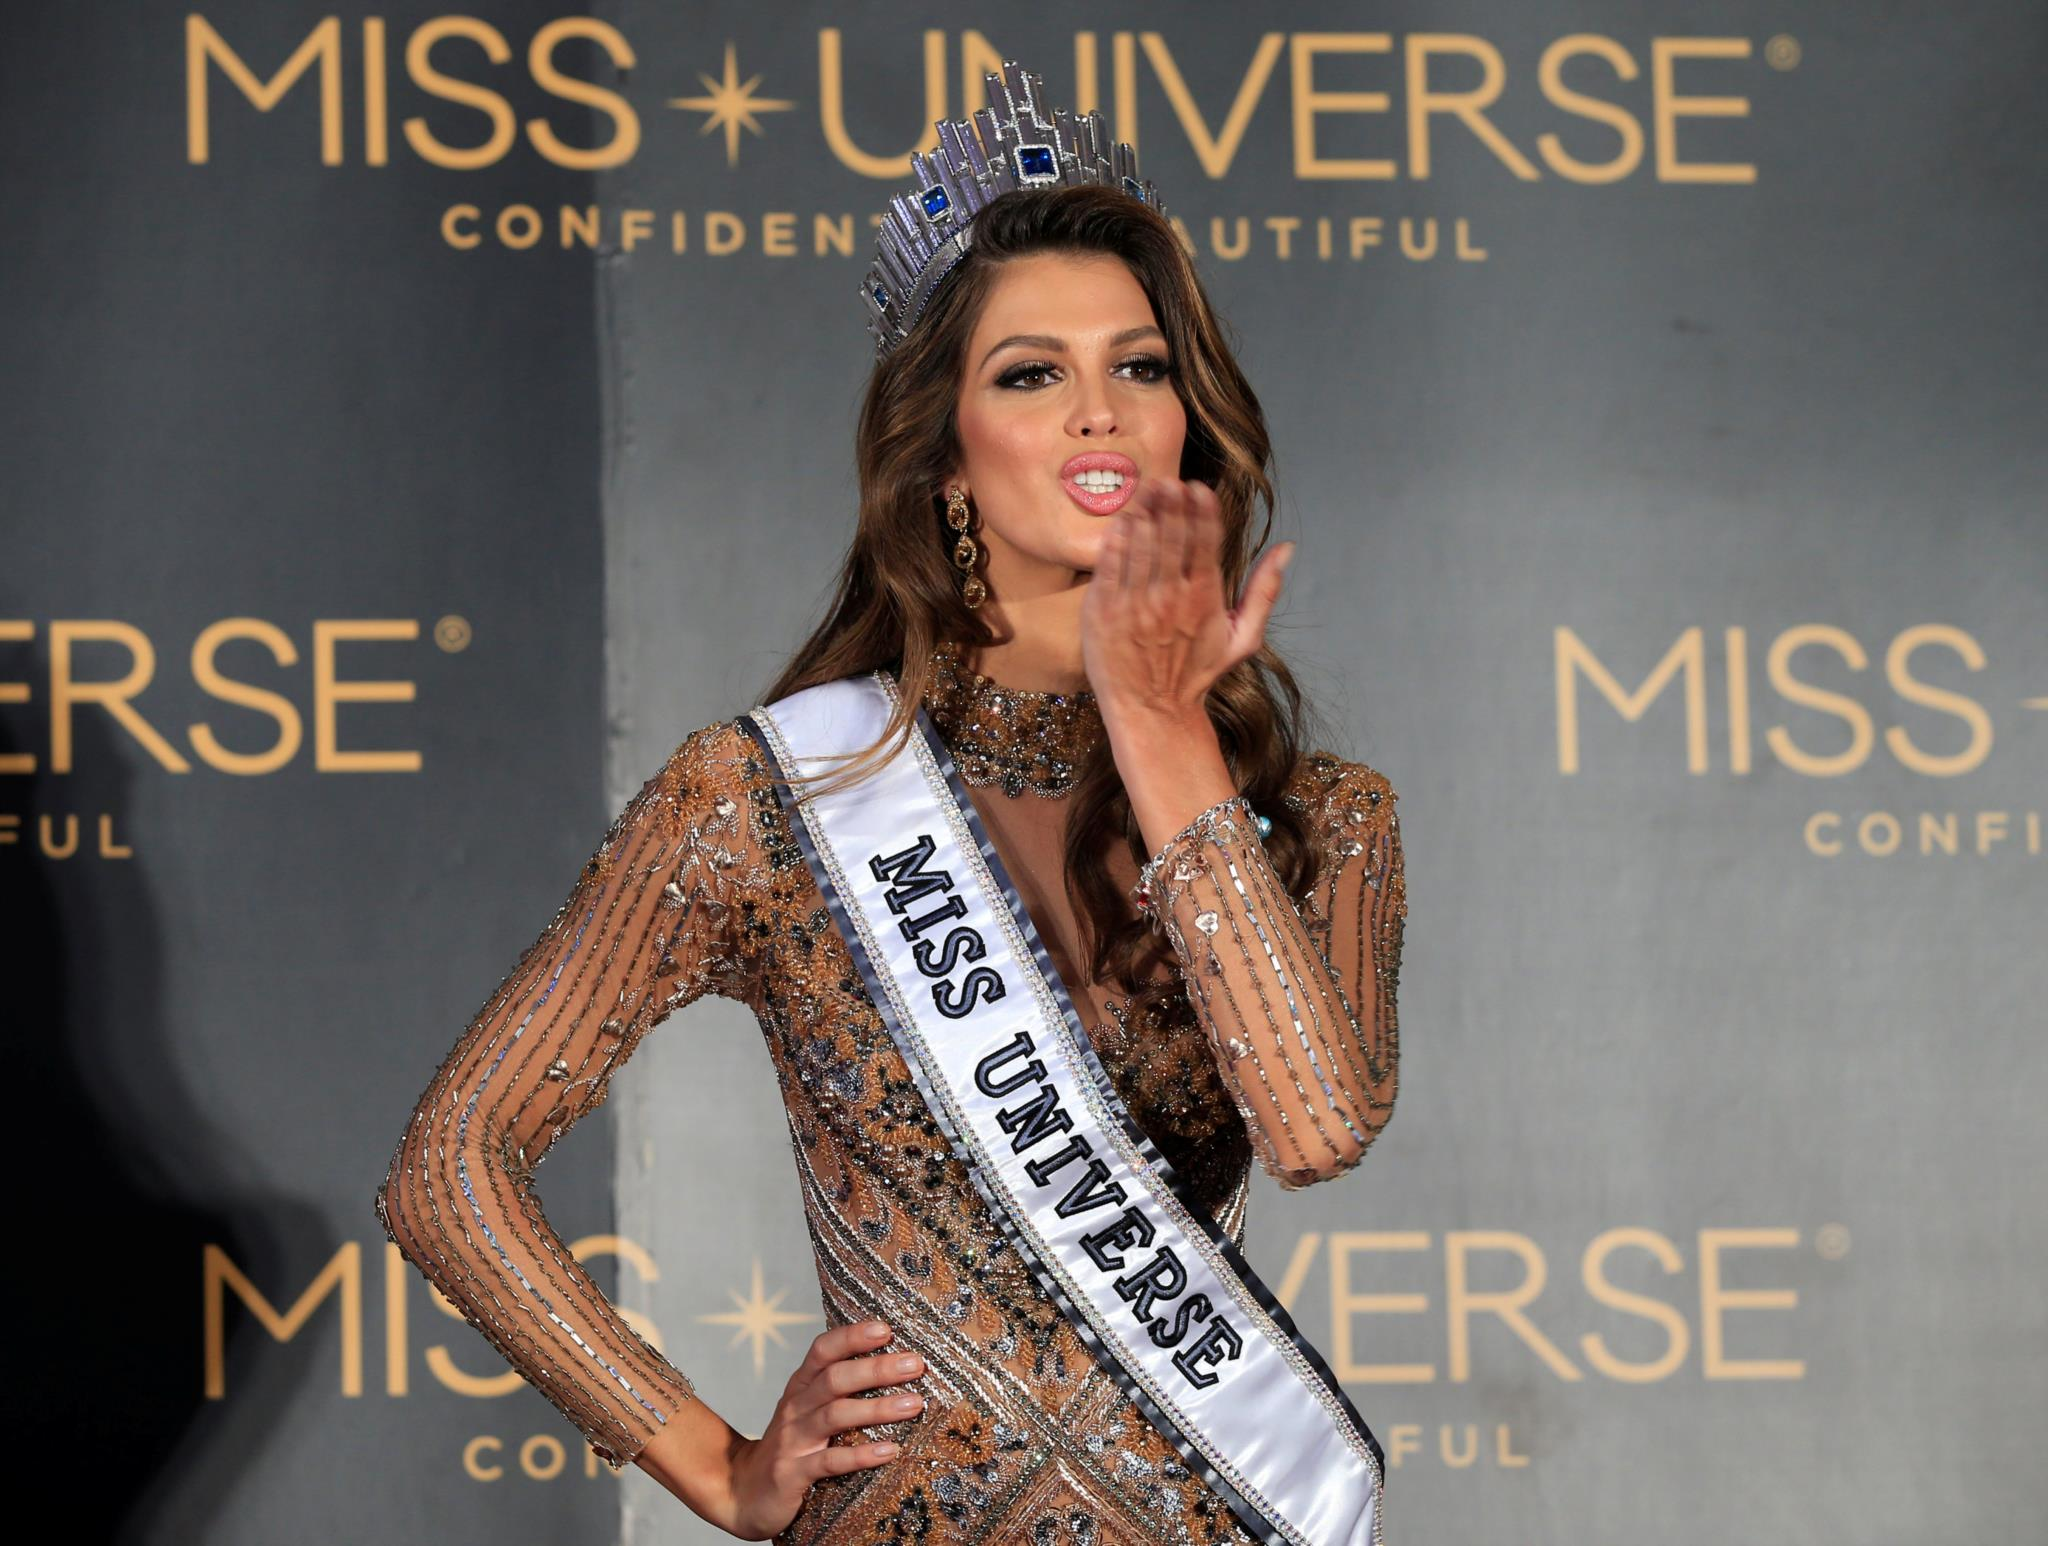 A francesa Iris Mittenaere fez regressar o título de Miss Universo à Europa